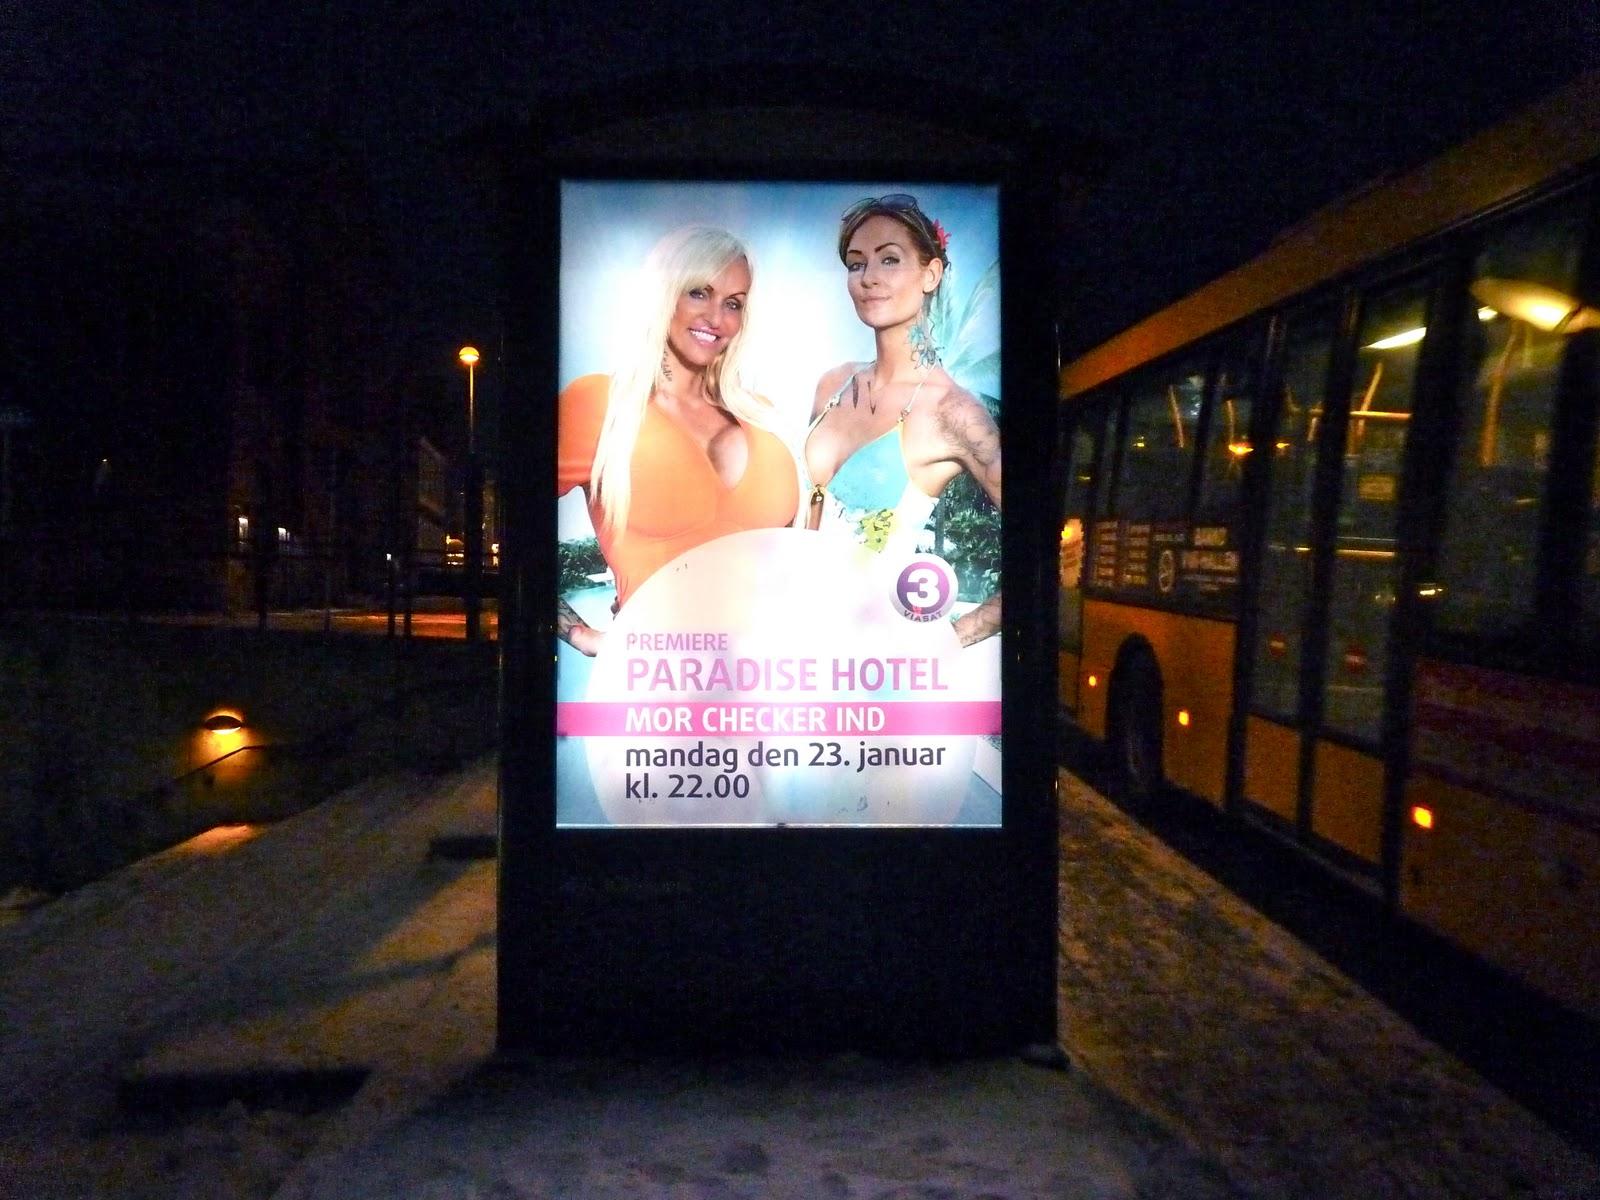 strittende bryster Lalandia Rødby bio